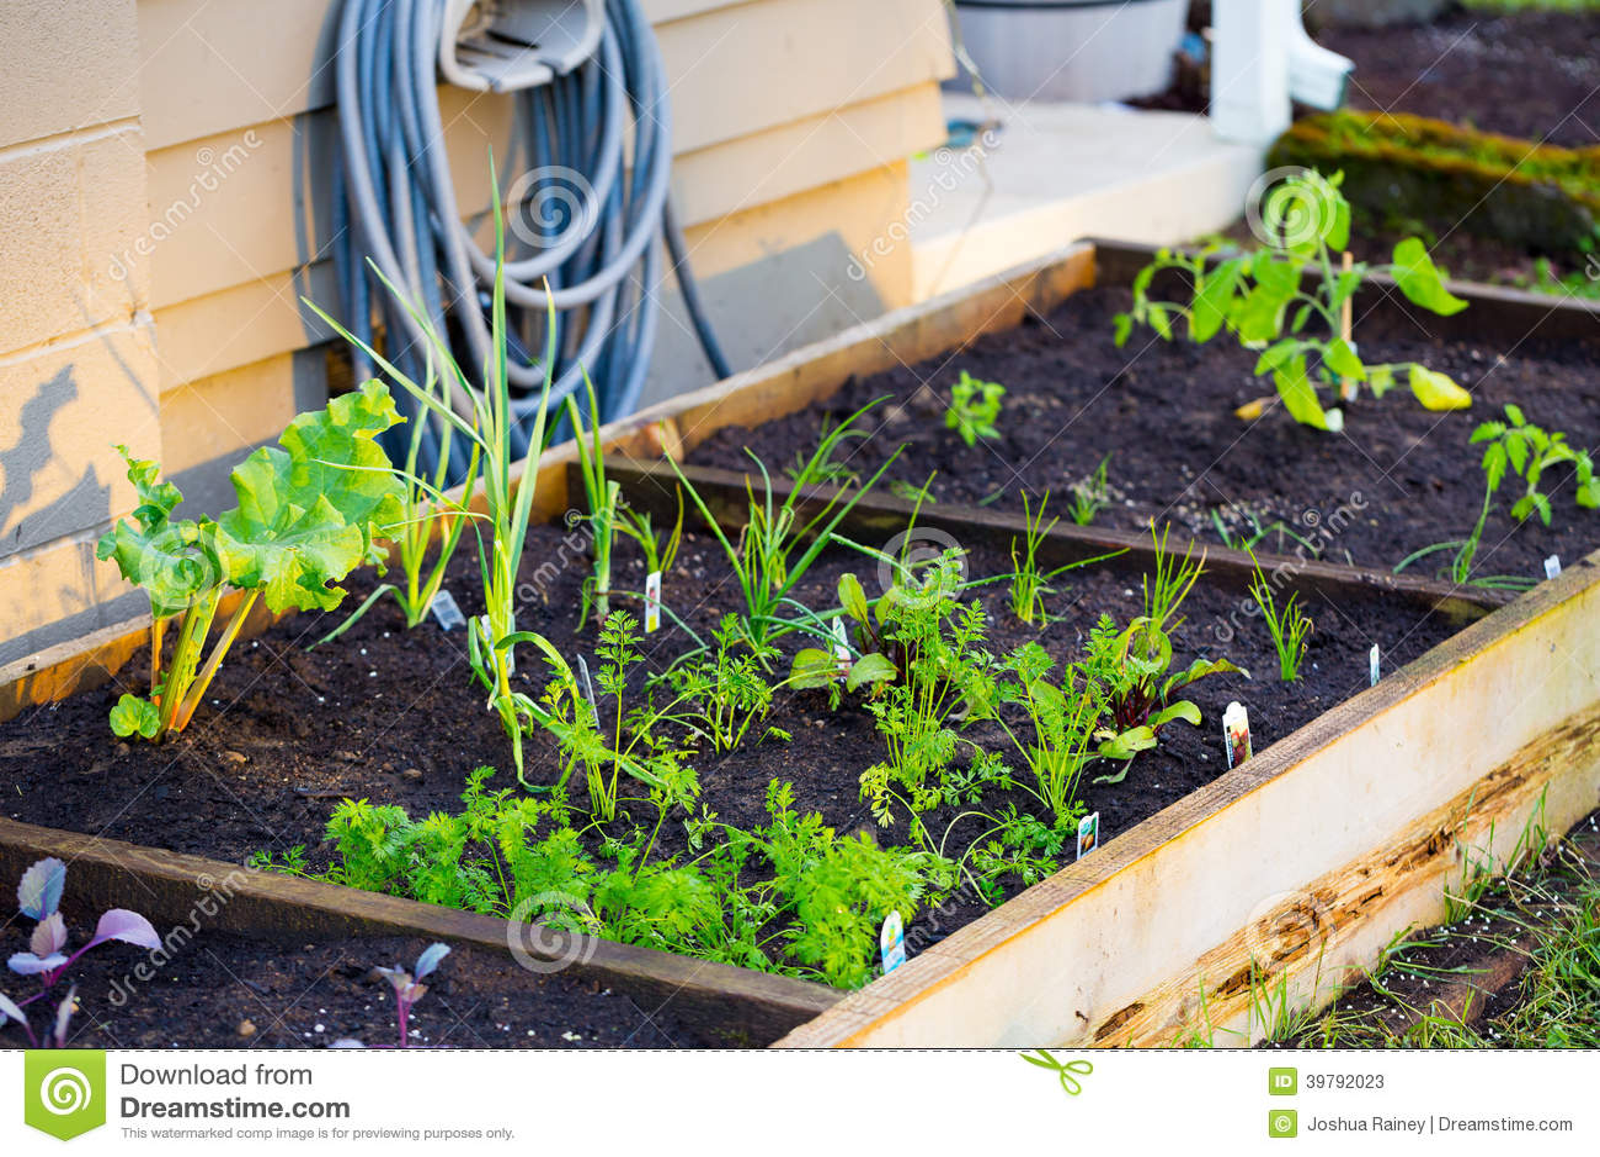 Organic gardening stock photo image 39792023 - Nature s care organic garden soil ...